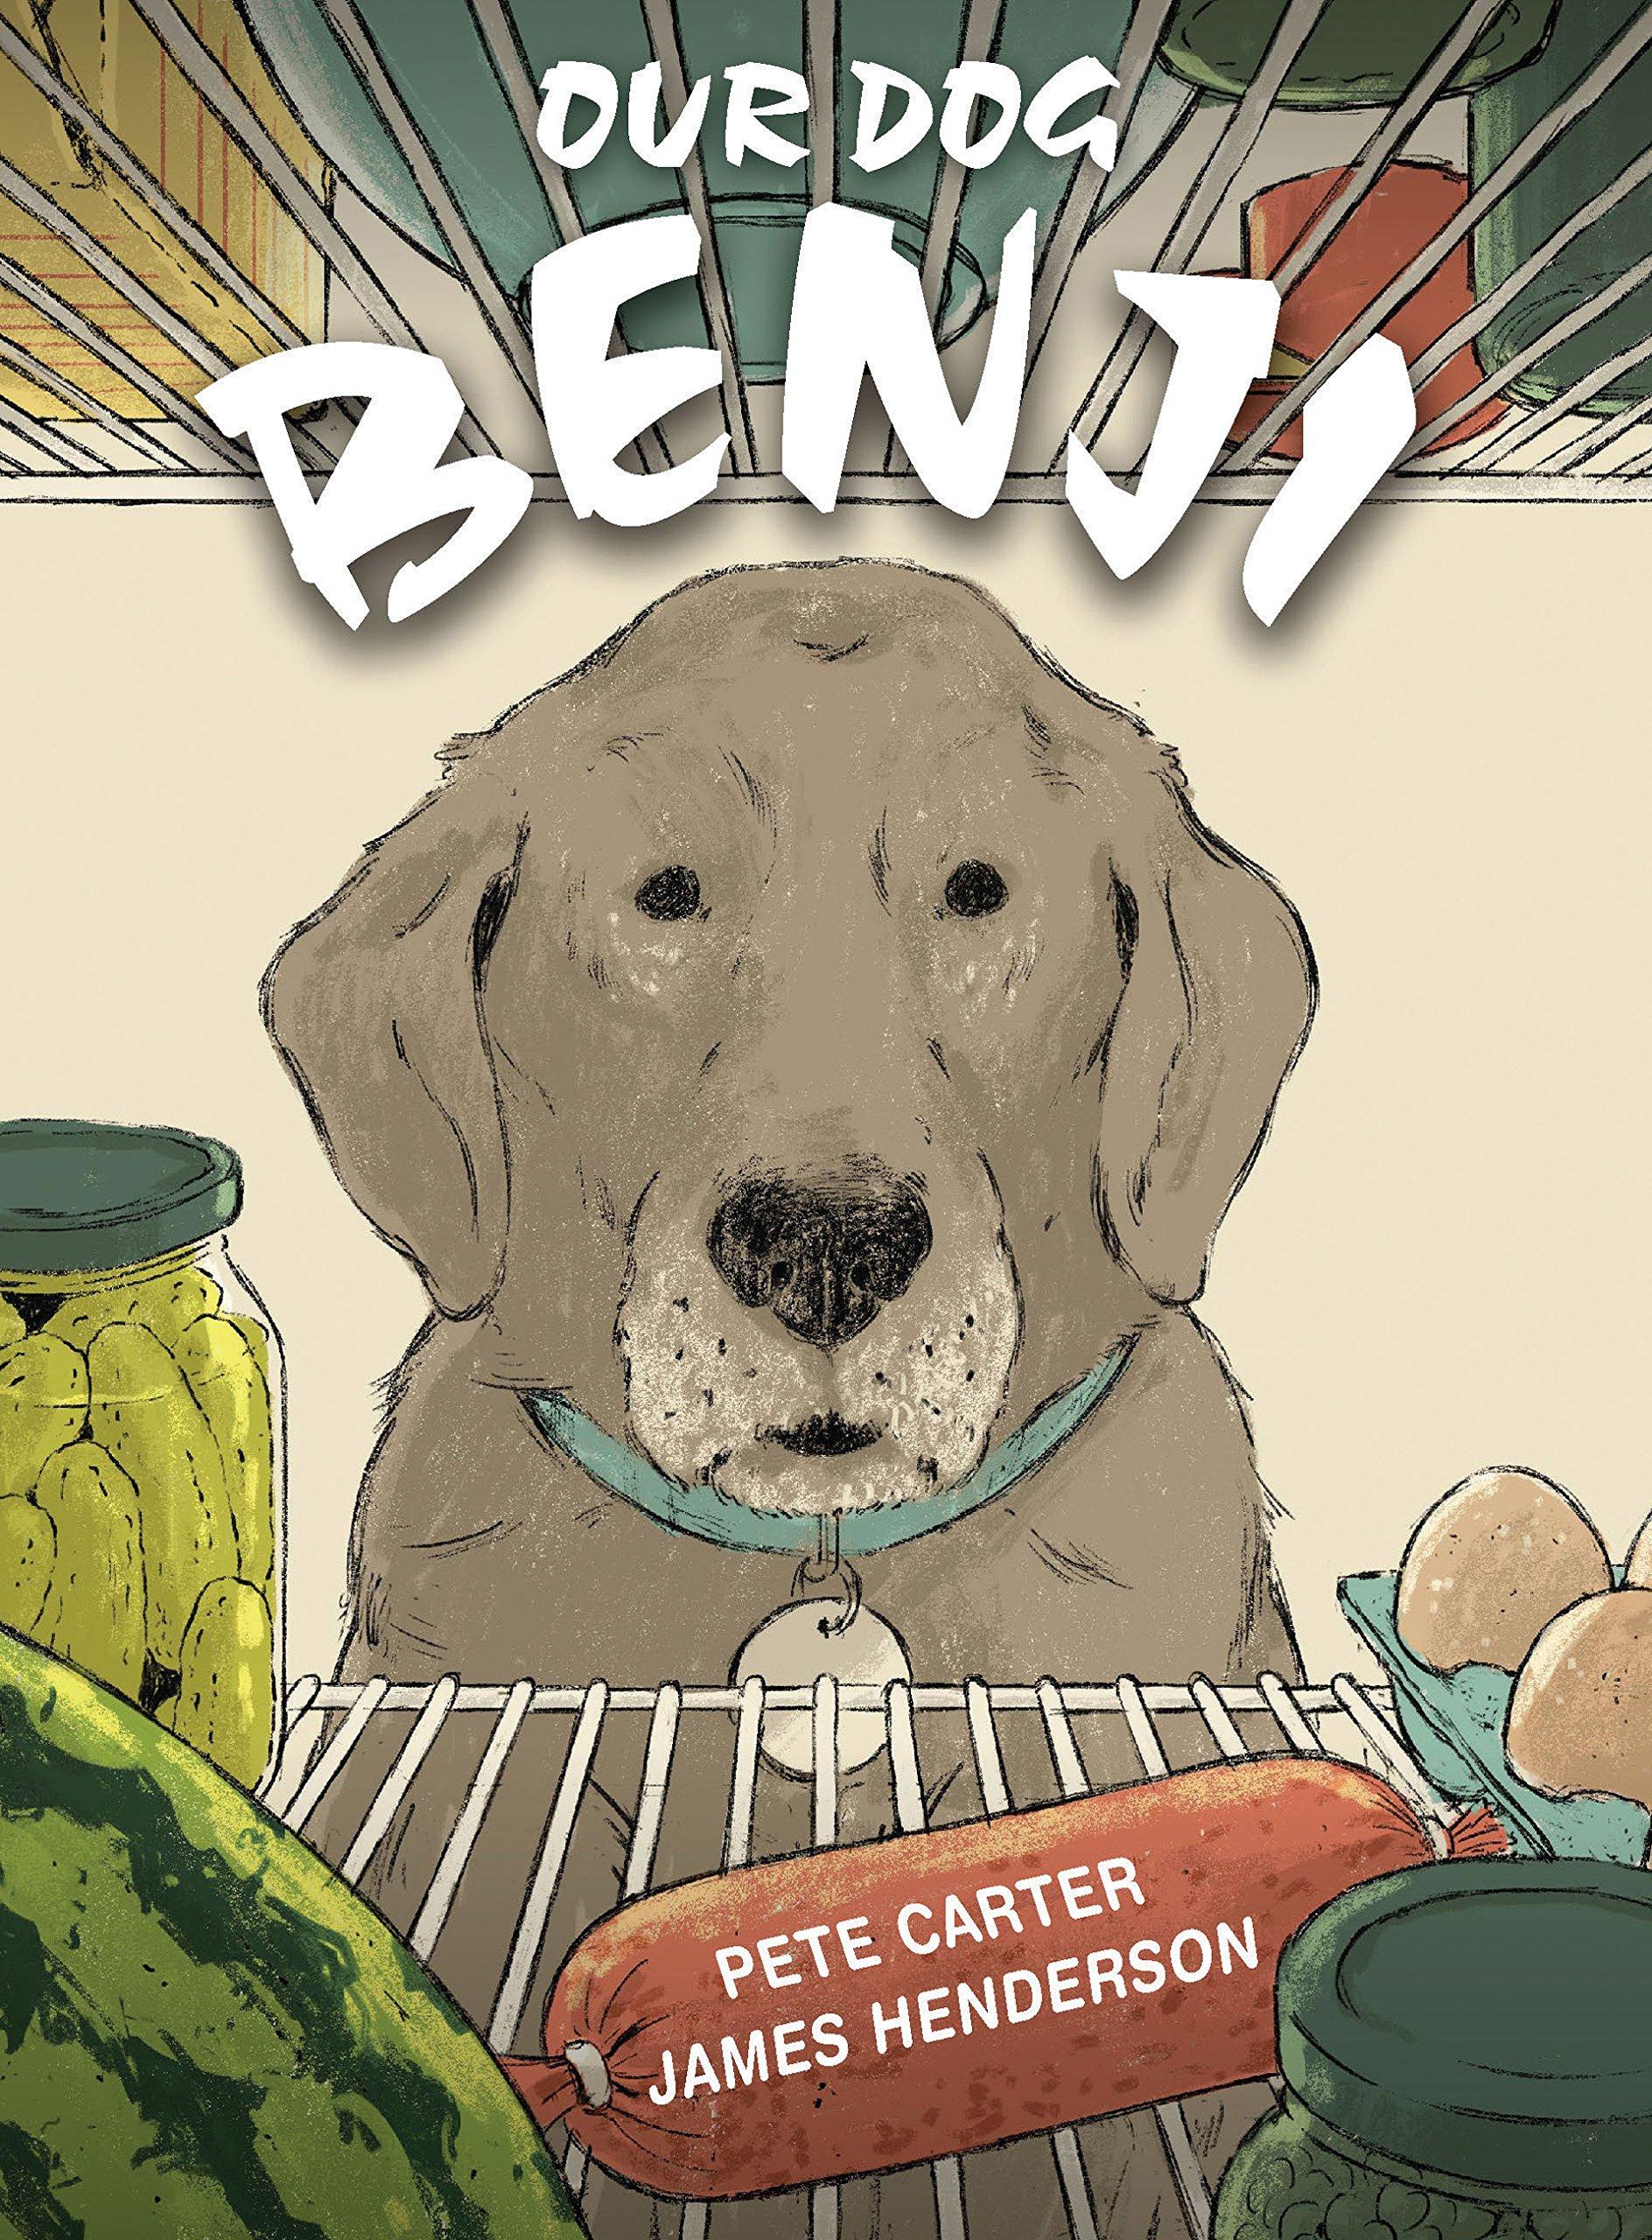 Read Online Our Dog Benji pdf